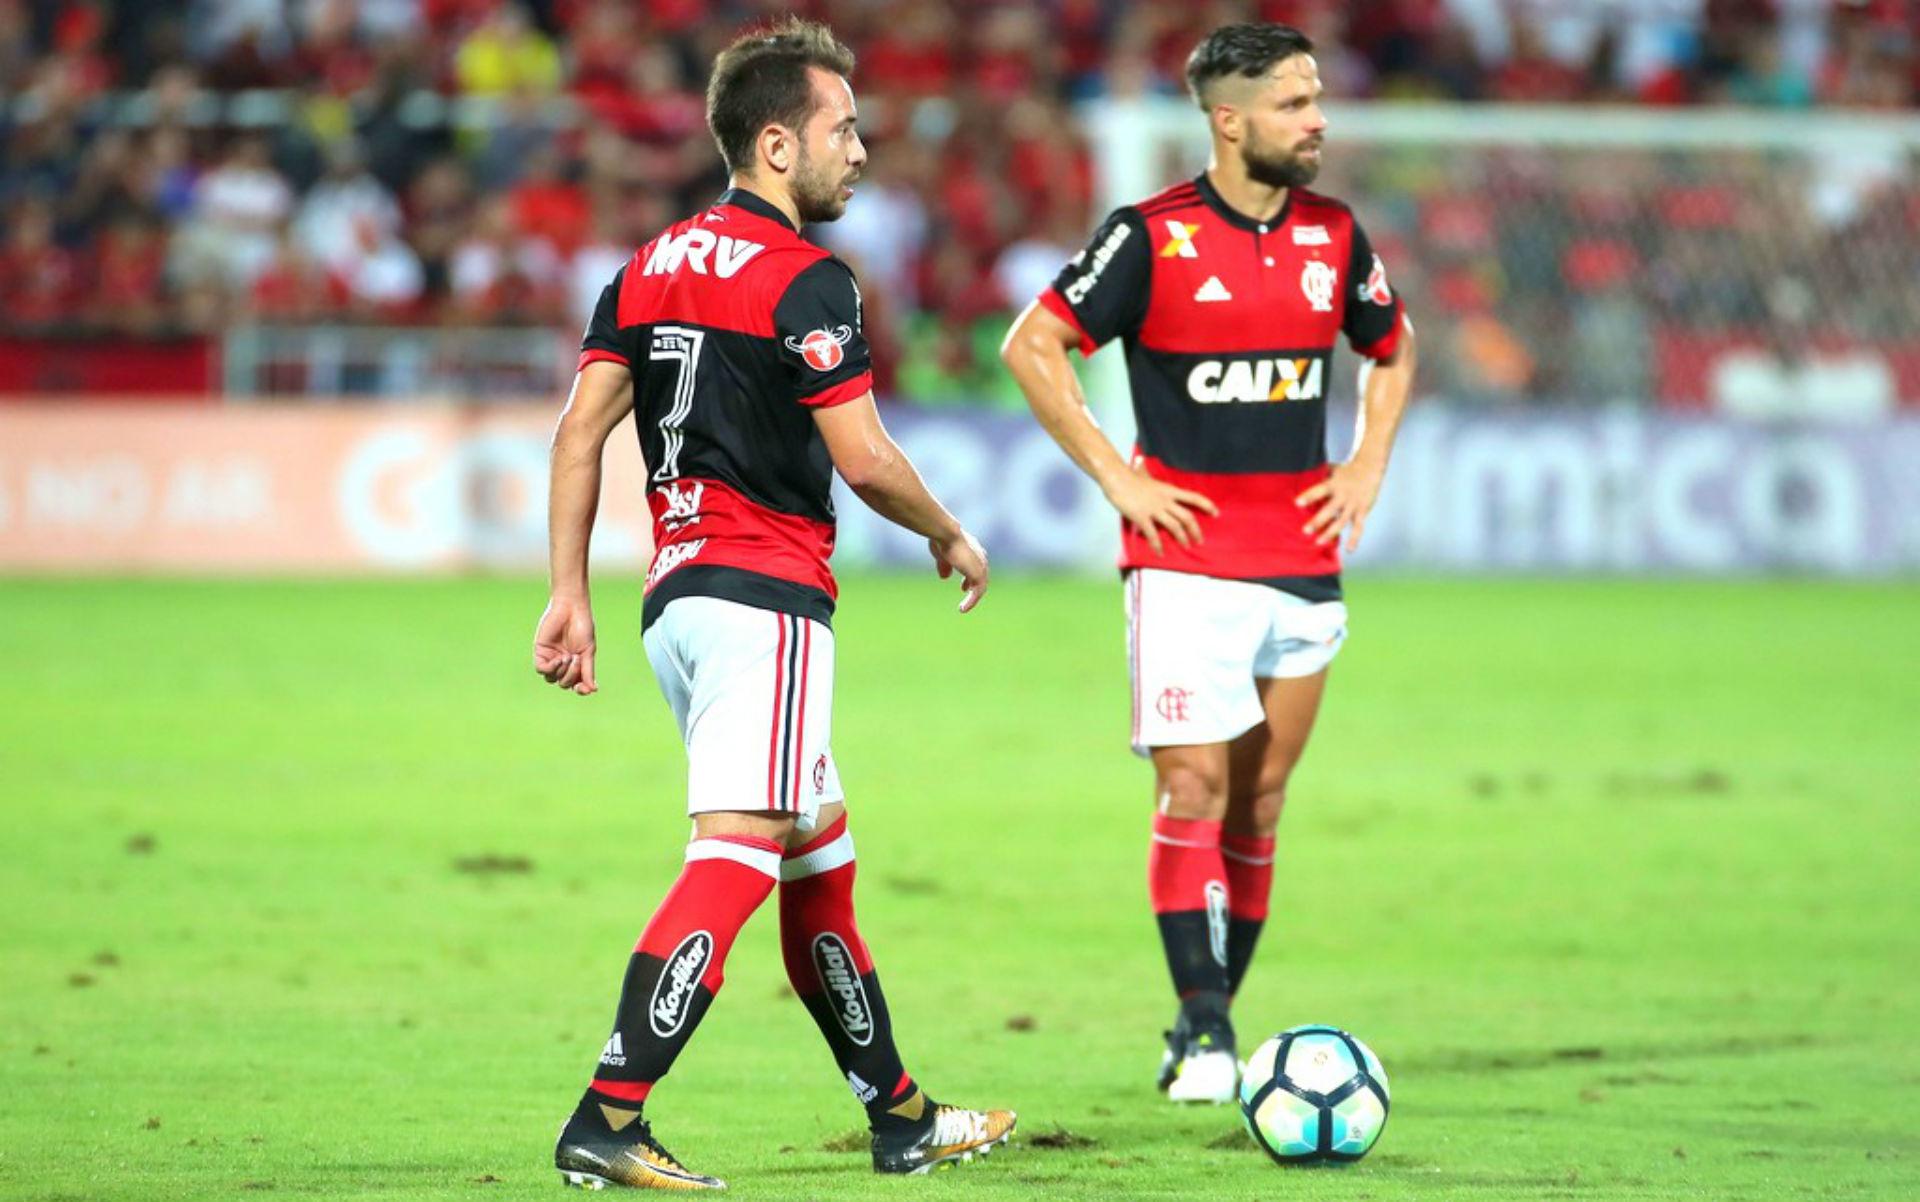 Diego e Everton Ribeiro